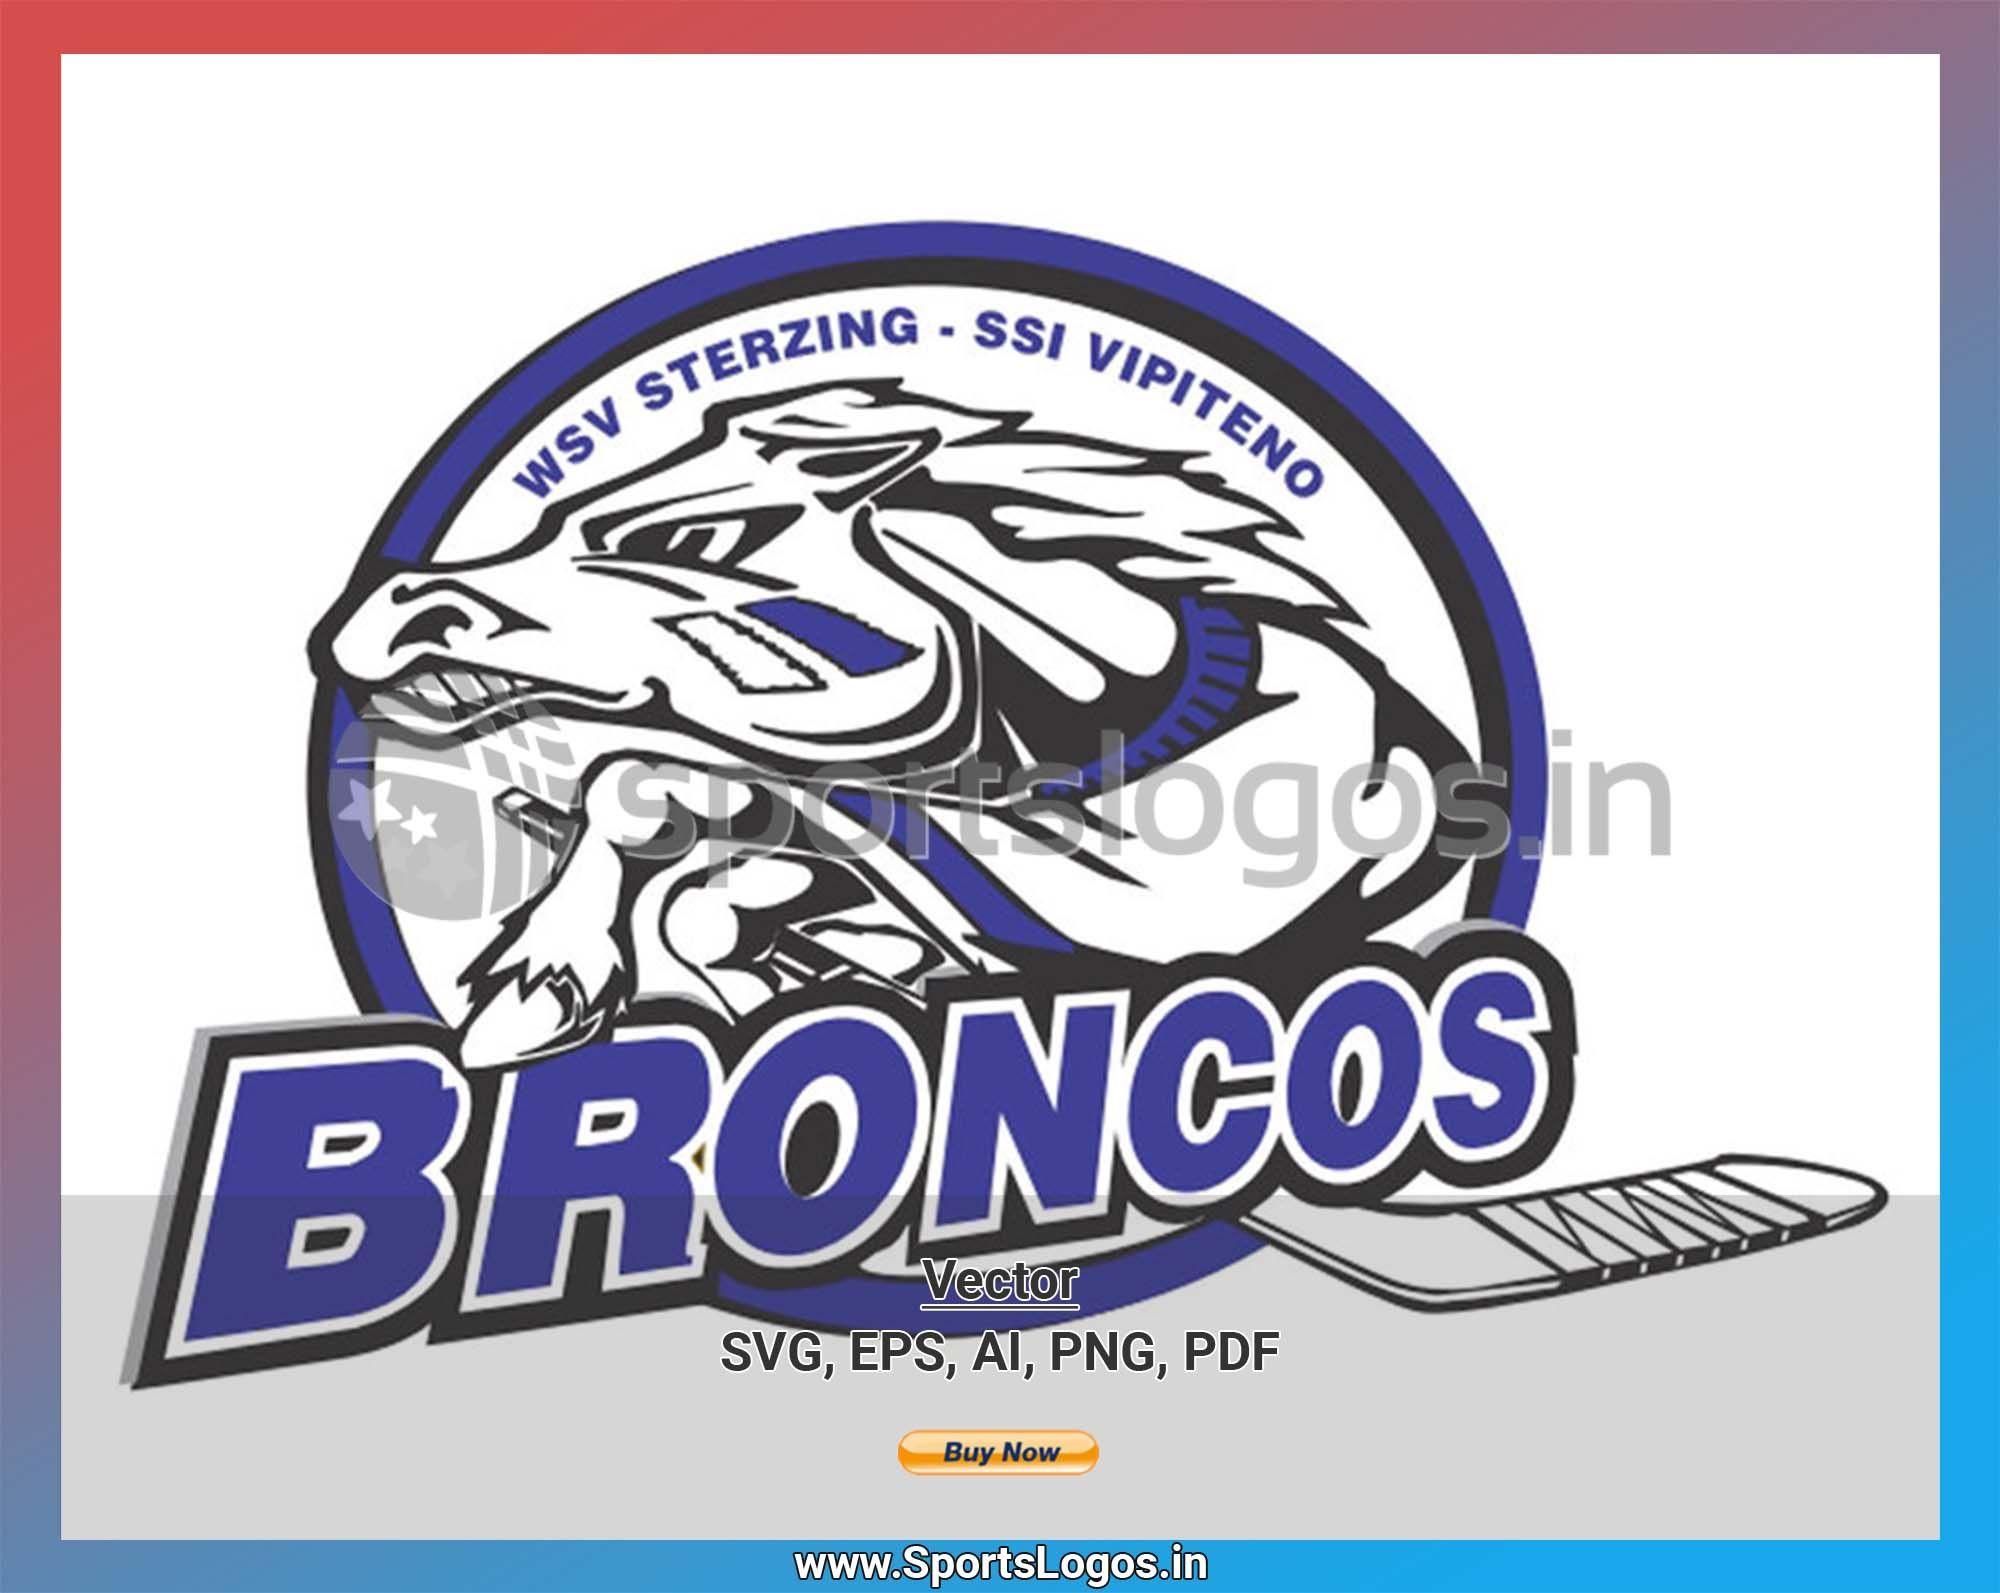 WSV Sterzing Broncos Hockey Sports Vector SVG Logo in 5